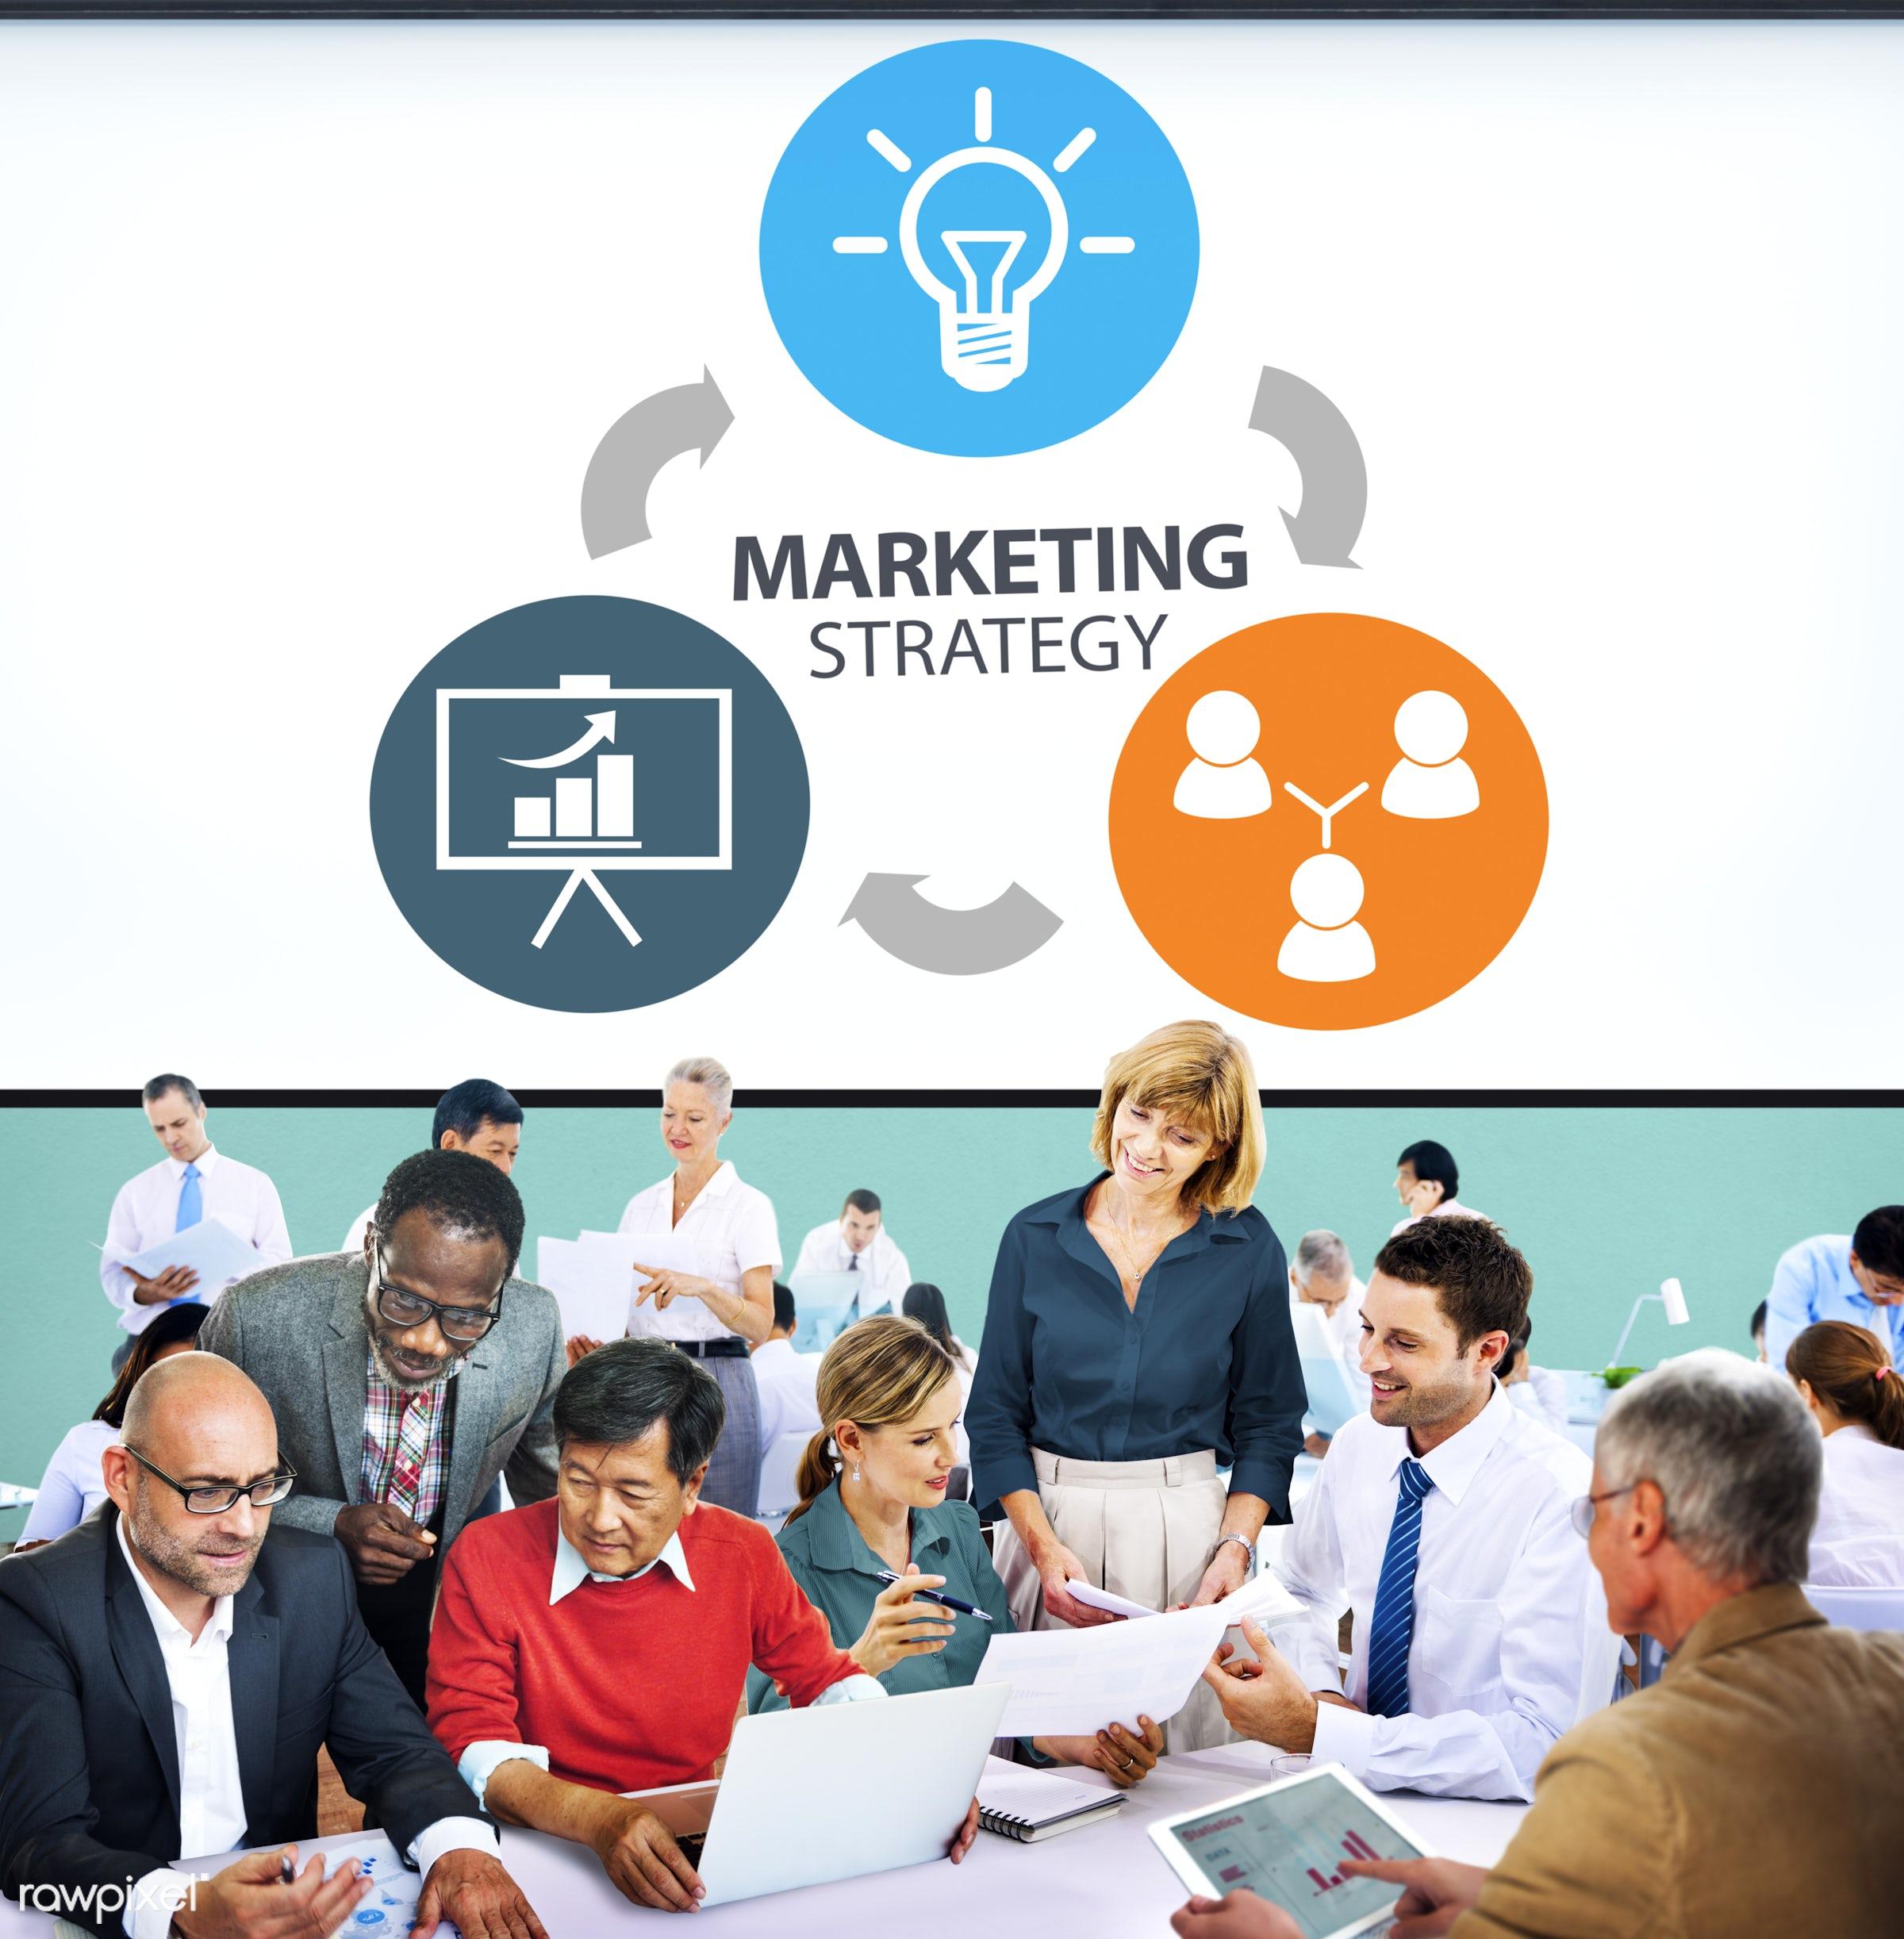 advertisement, advertising, analysis, branding, business, business people, businessmen, businesswomen, busy, commercial,...